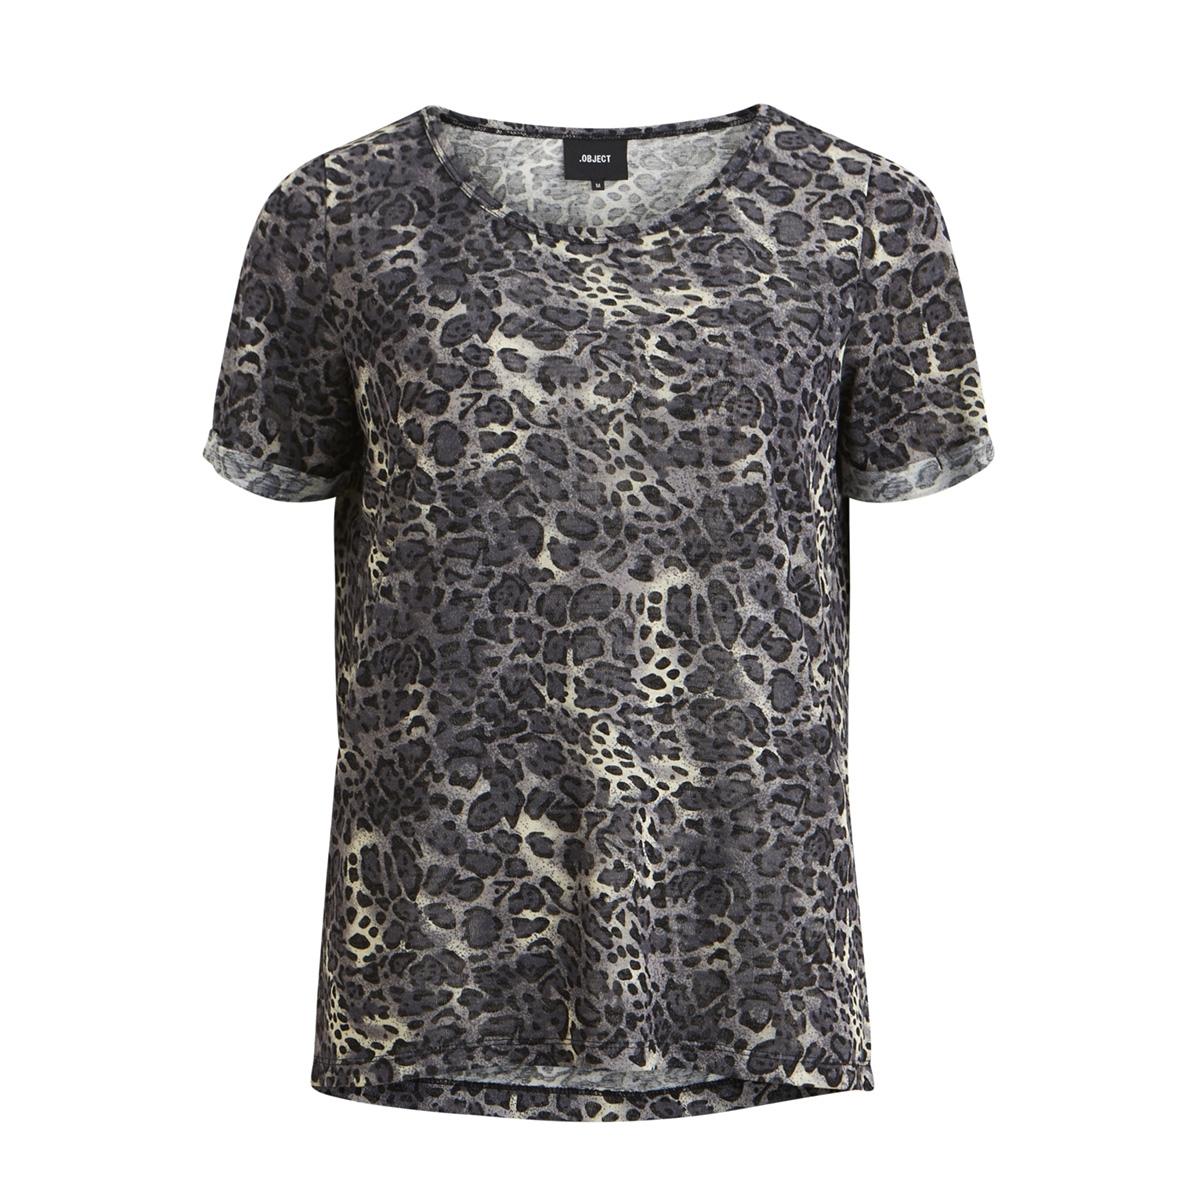 objanime s/s tessi tee a lmt 11 23030265 object t-shirt gardenia/leo